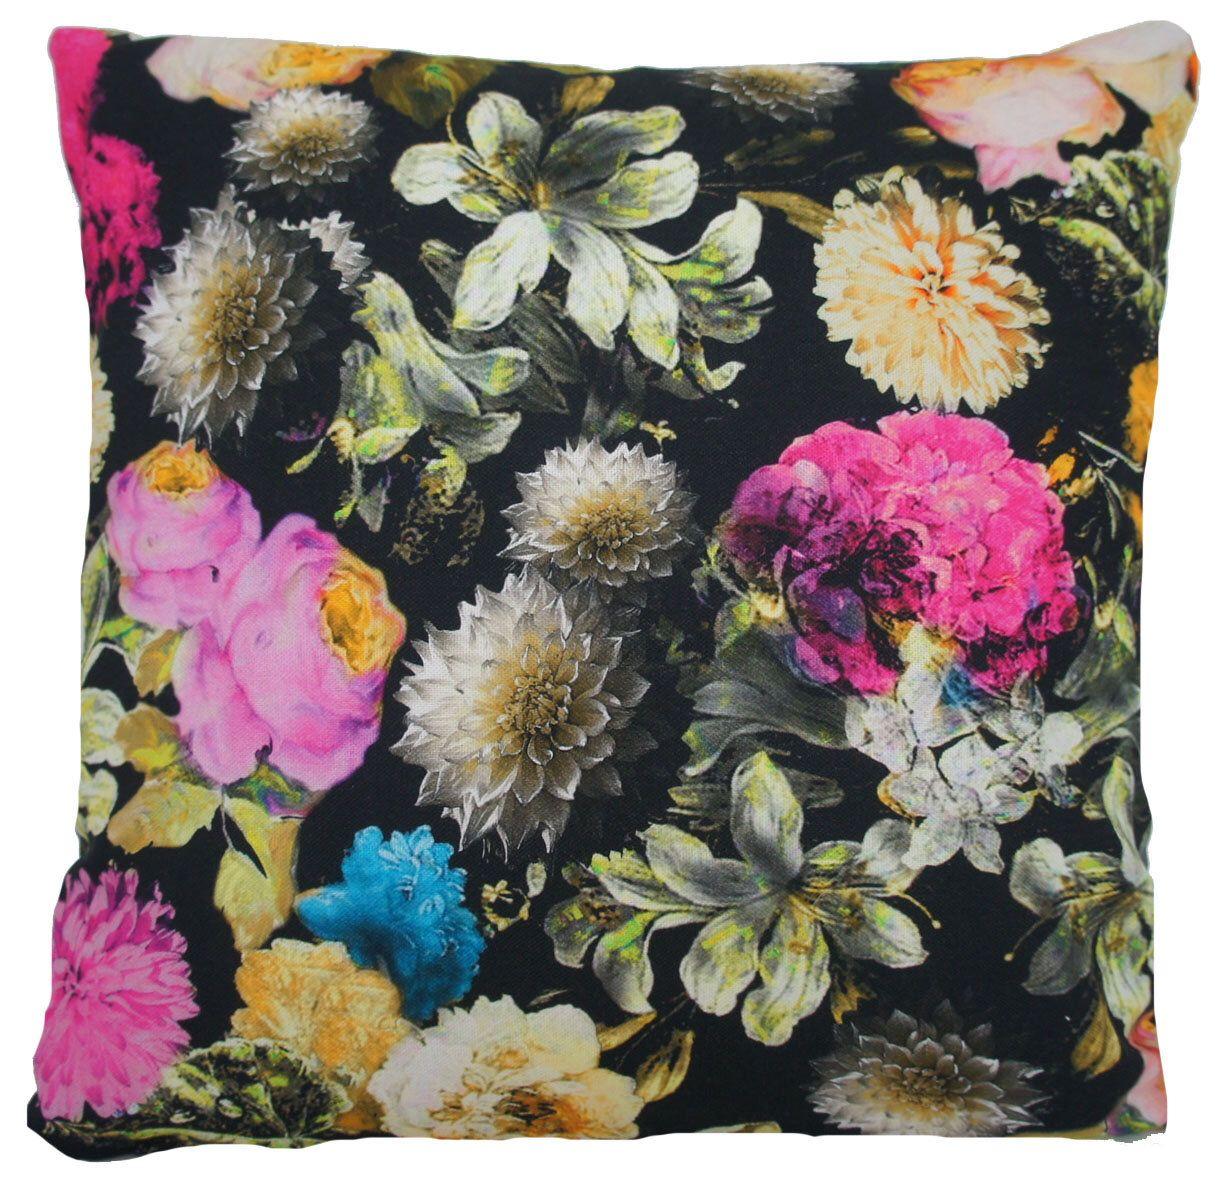 Pin on Bedding + Pillows.